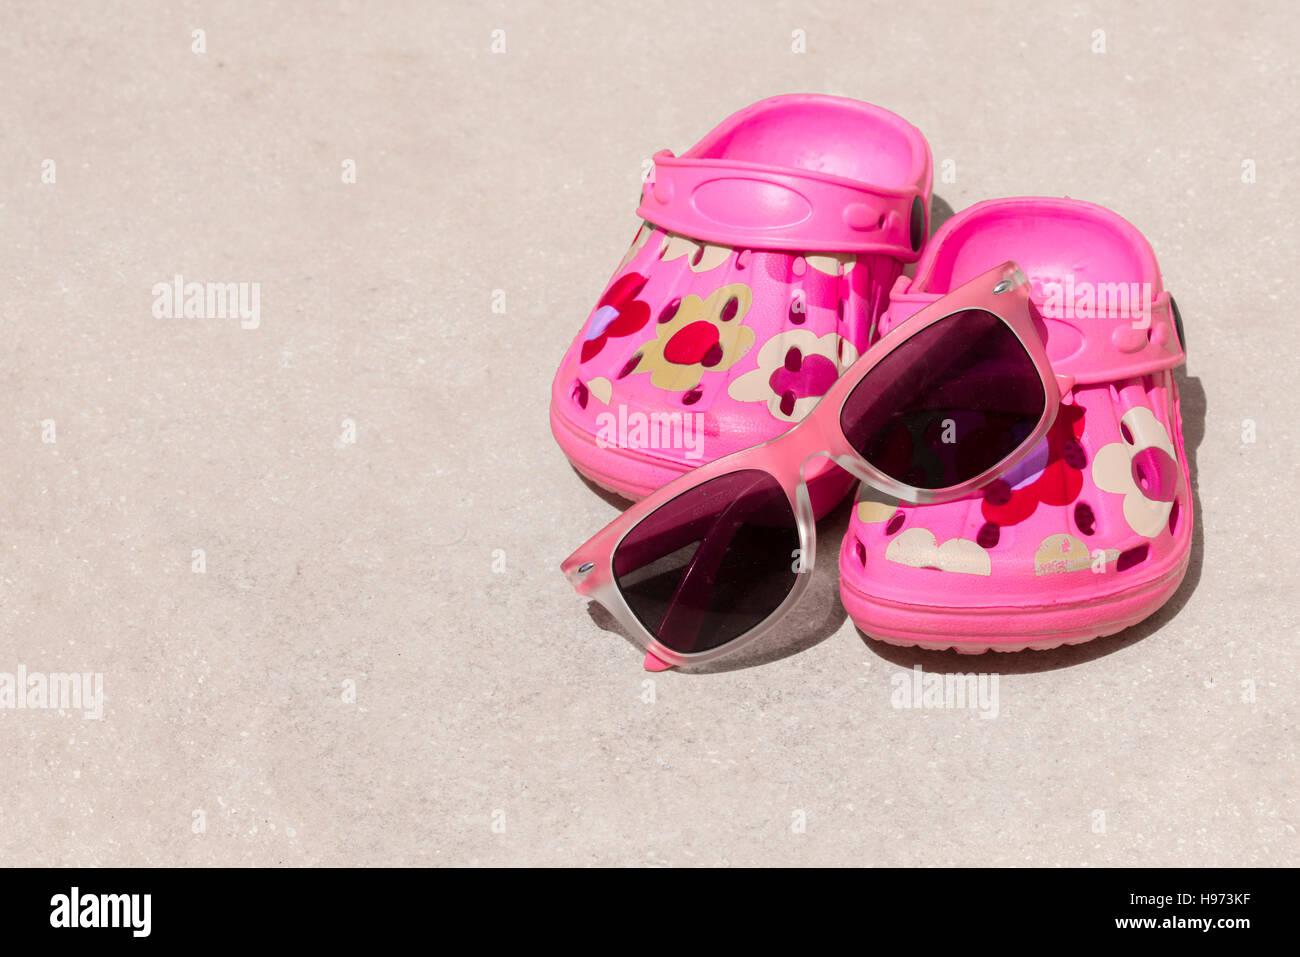 c9609efbf4942 Pink beach kid s crocs and sunglasses on sandy beach.Beach sandals and  sunglasses in the